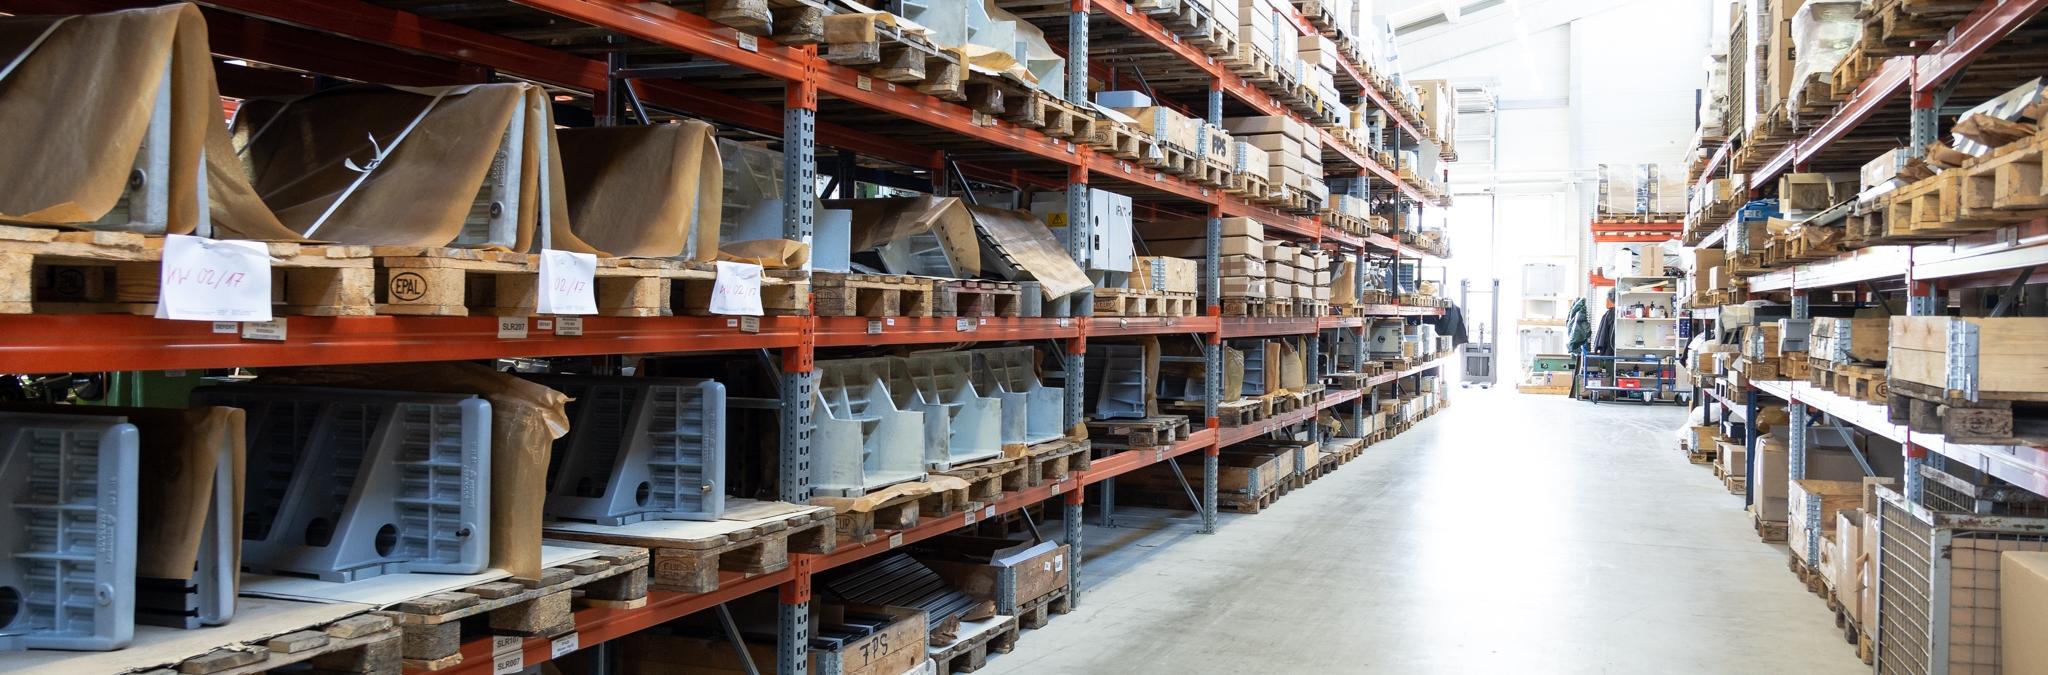 FPS Werkzeugmaschinen Ersatzteile